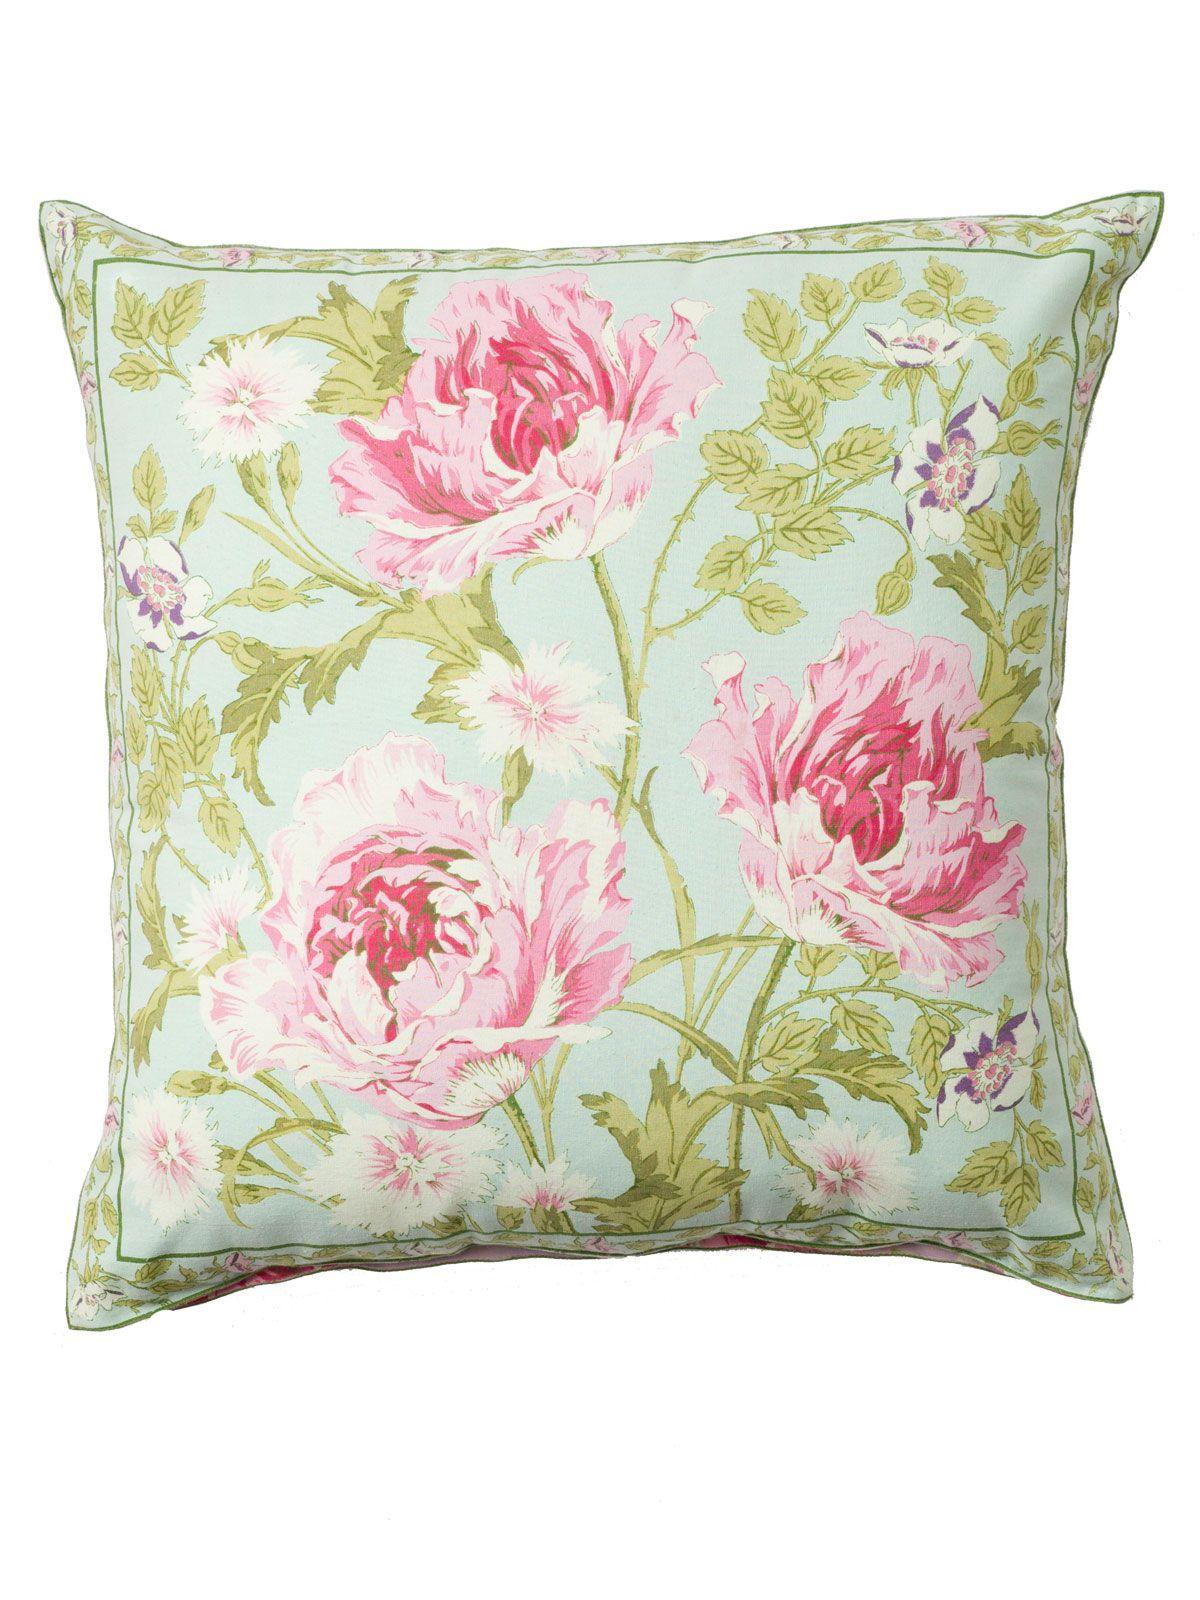 taie d/'oreiller pillow for teepee deorative pillow Kissenbezug pillowcase Roses on blue pillow for kids room |